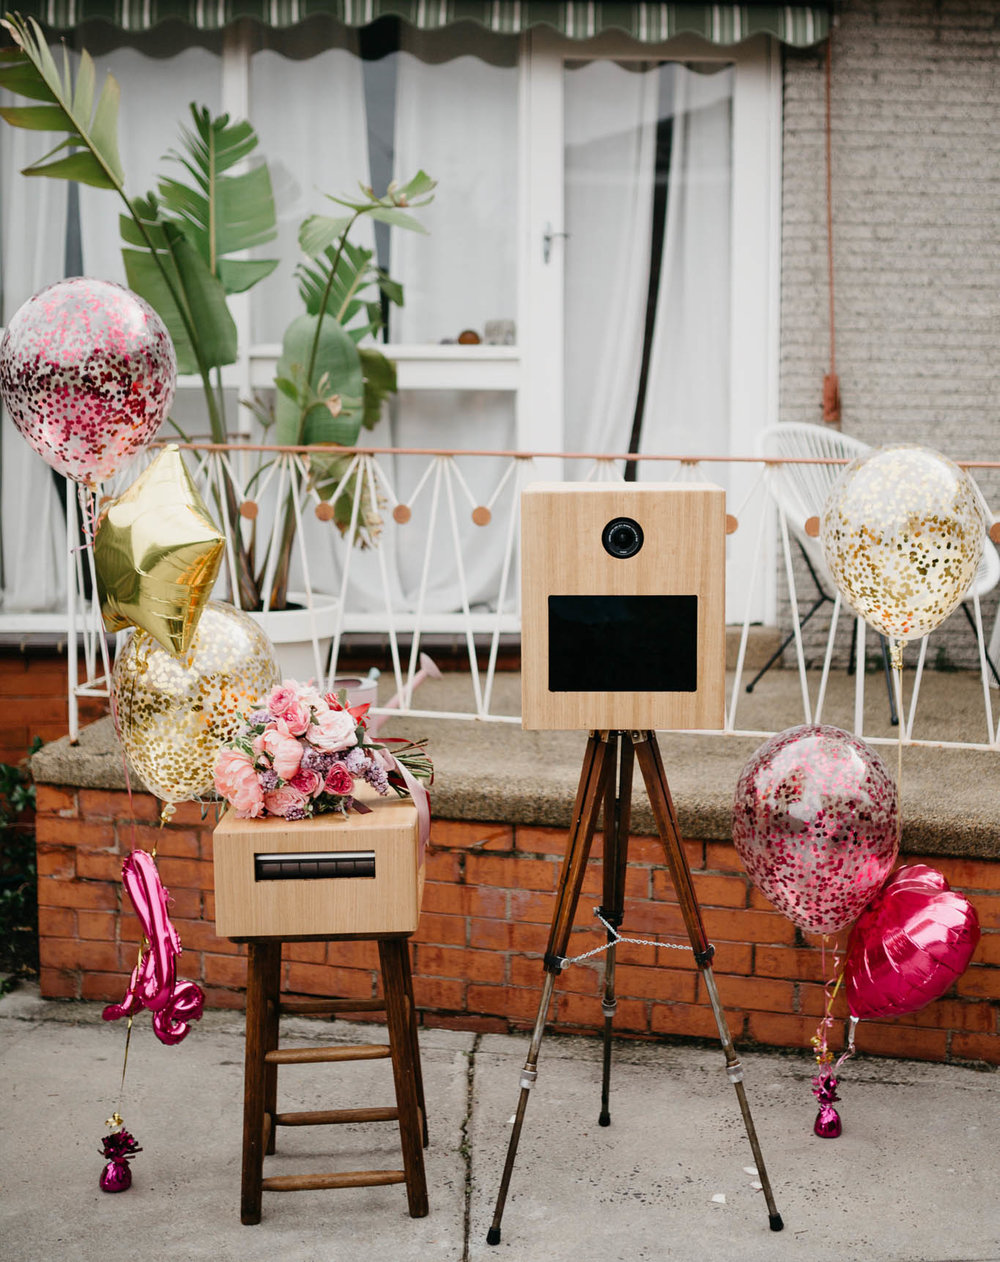 Heartbreak Hotel Photo Booth.jpg